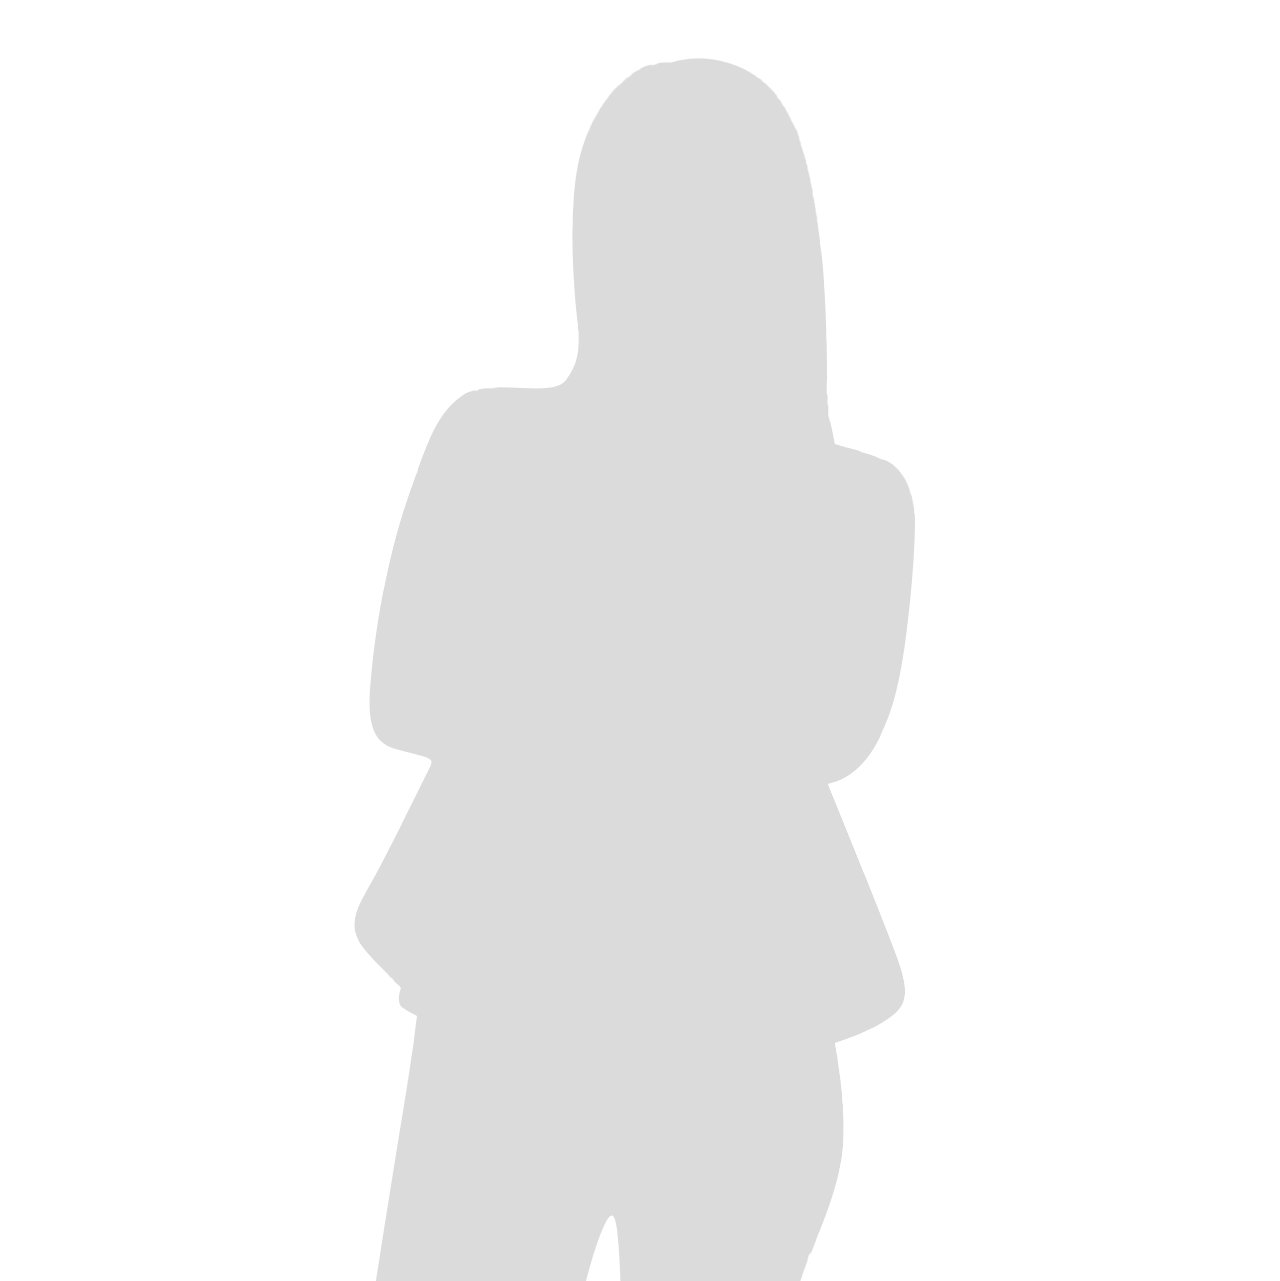 mitarbeiterin symbol